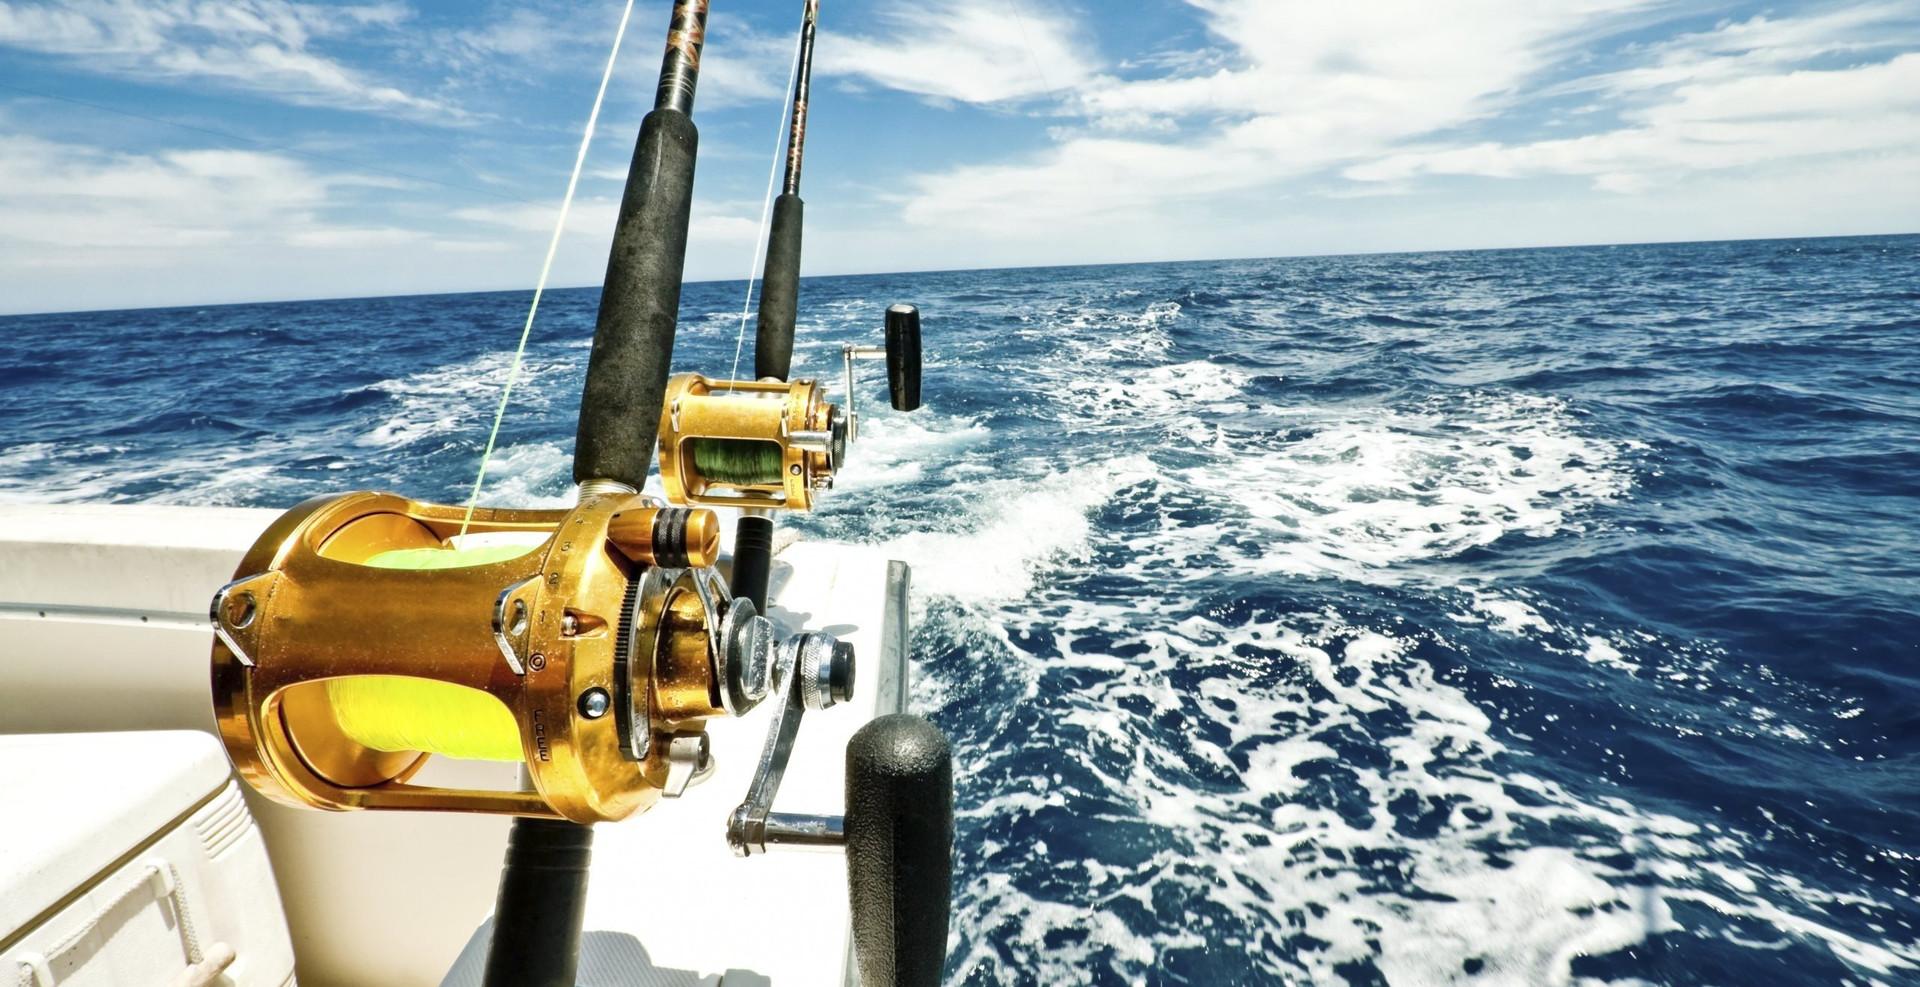 sea-fishing-boat-fishing-tackle-sea-fish